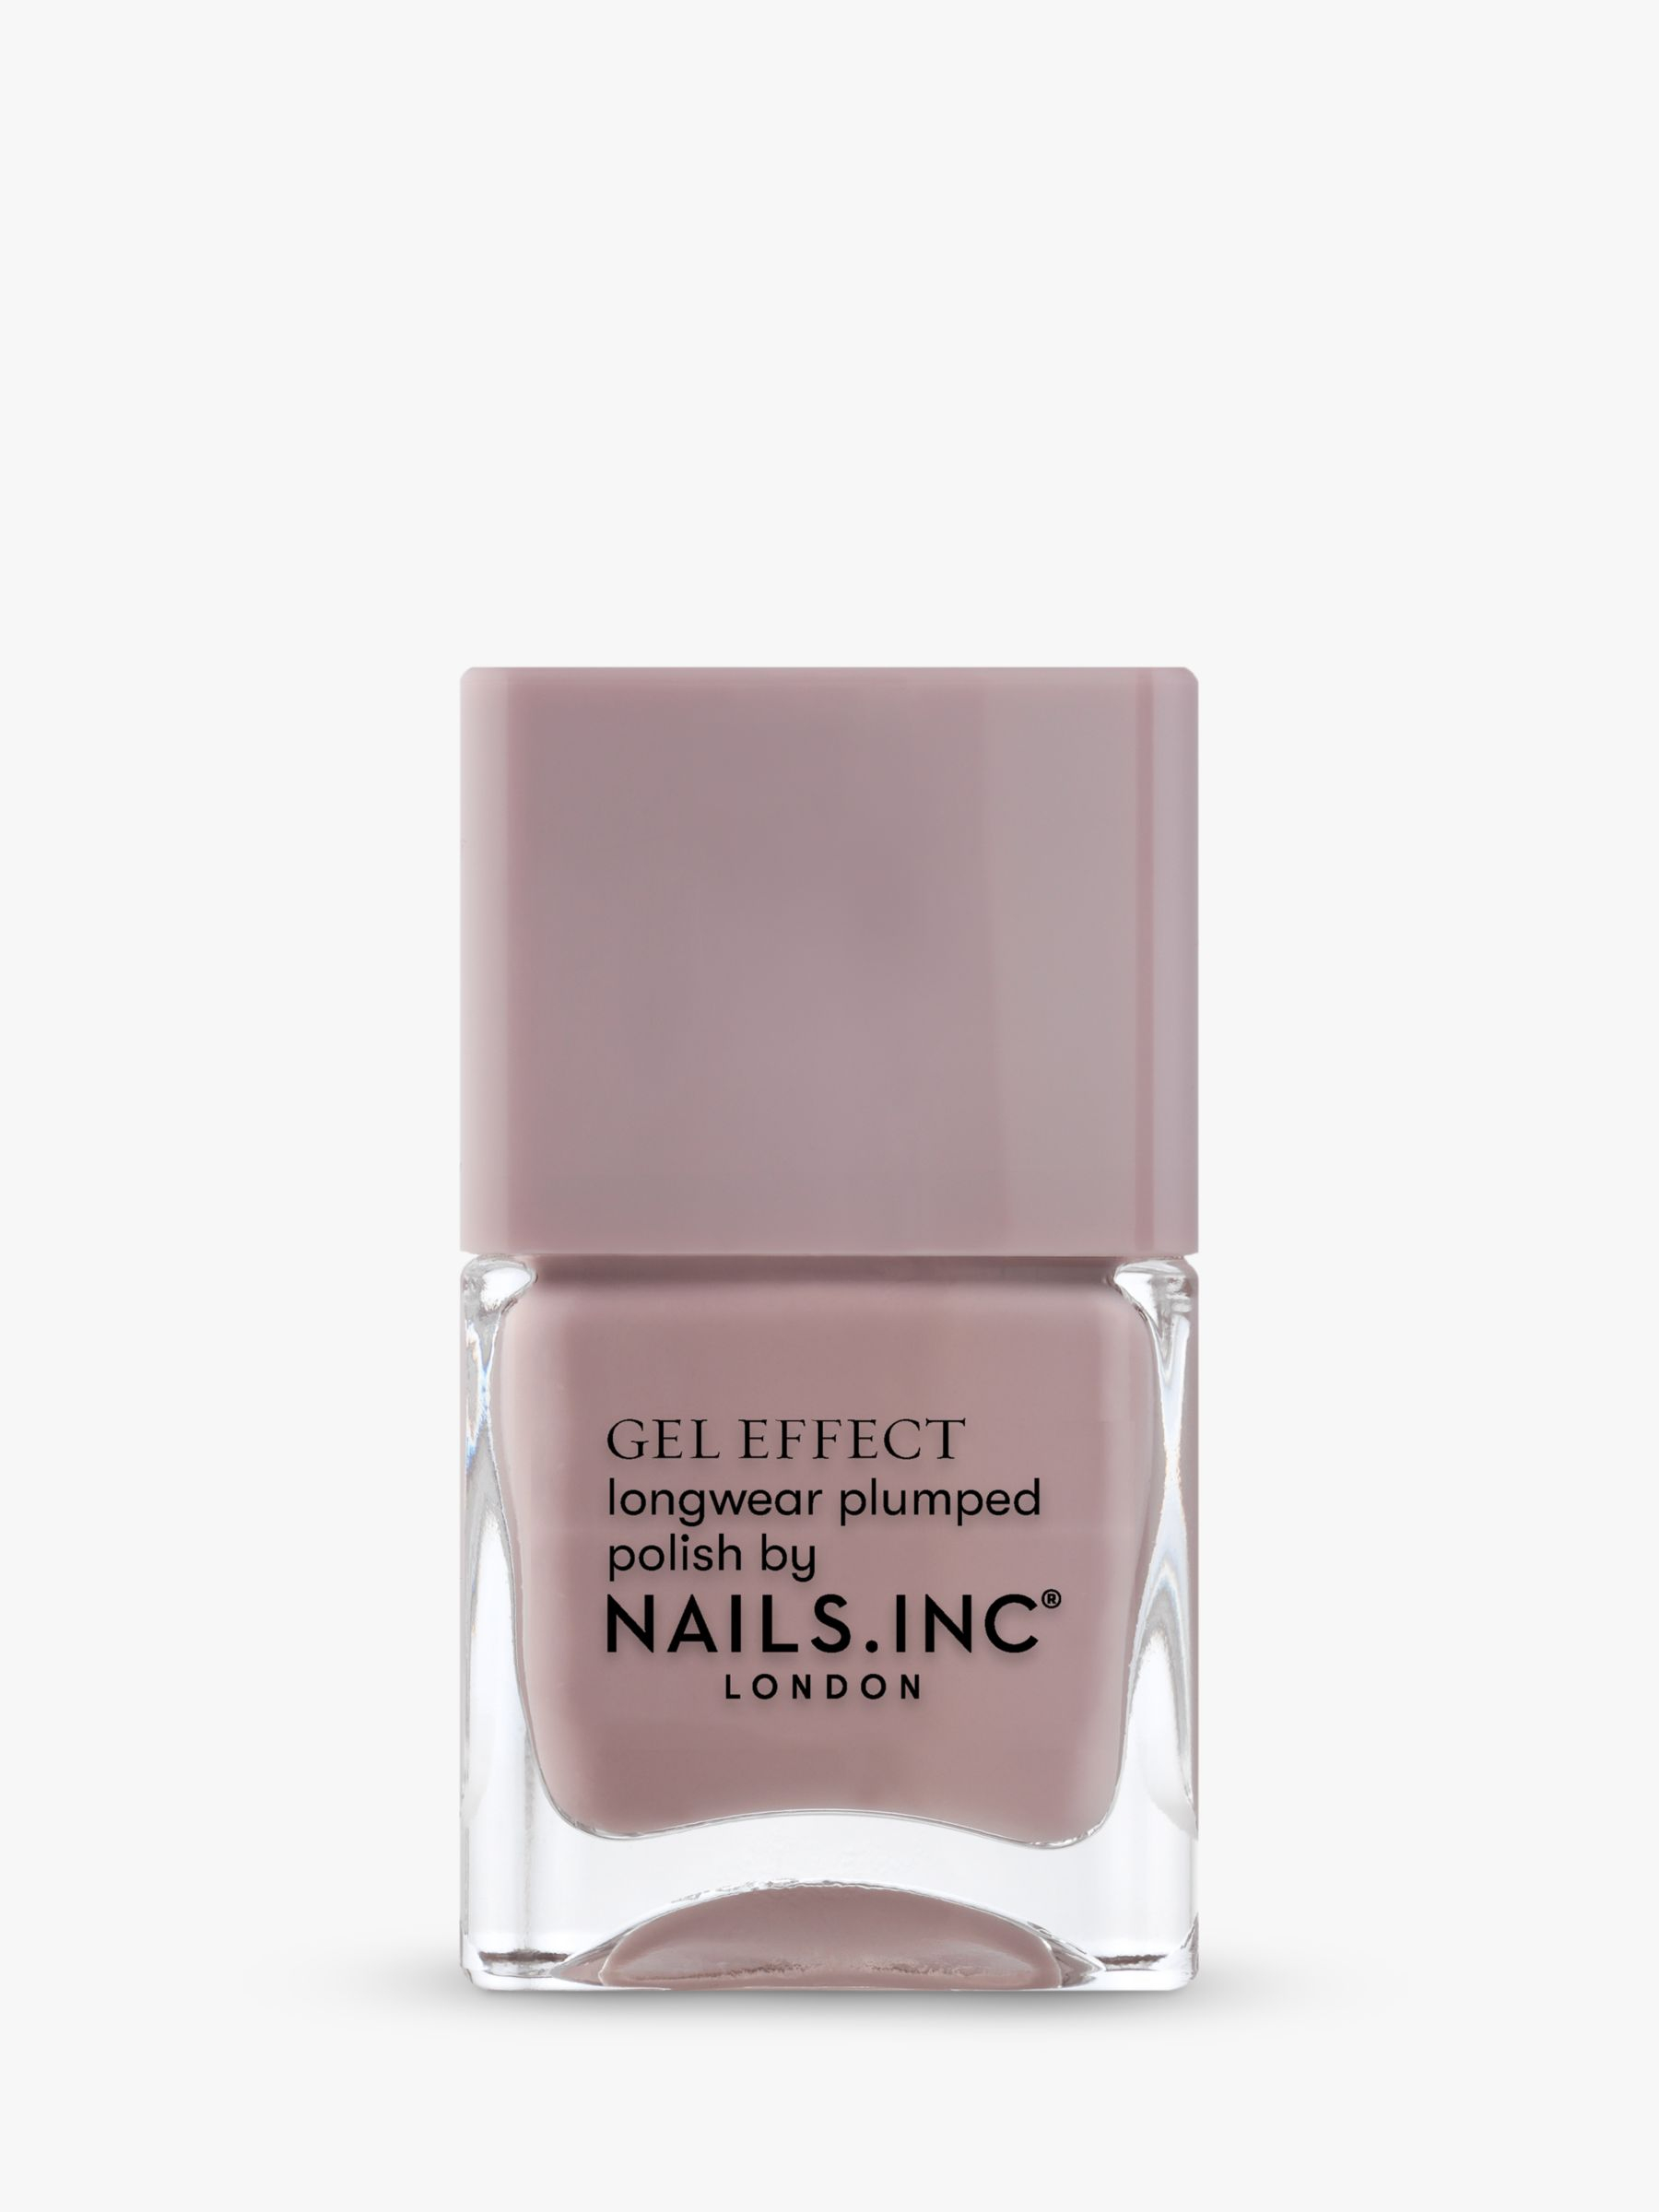 Nails Inc Gel Effect Nail Polish, 14ml, Porchester Square